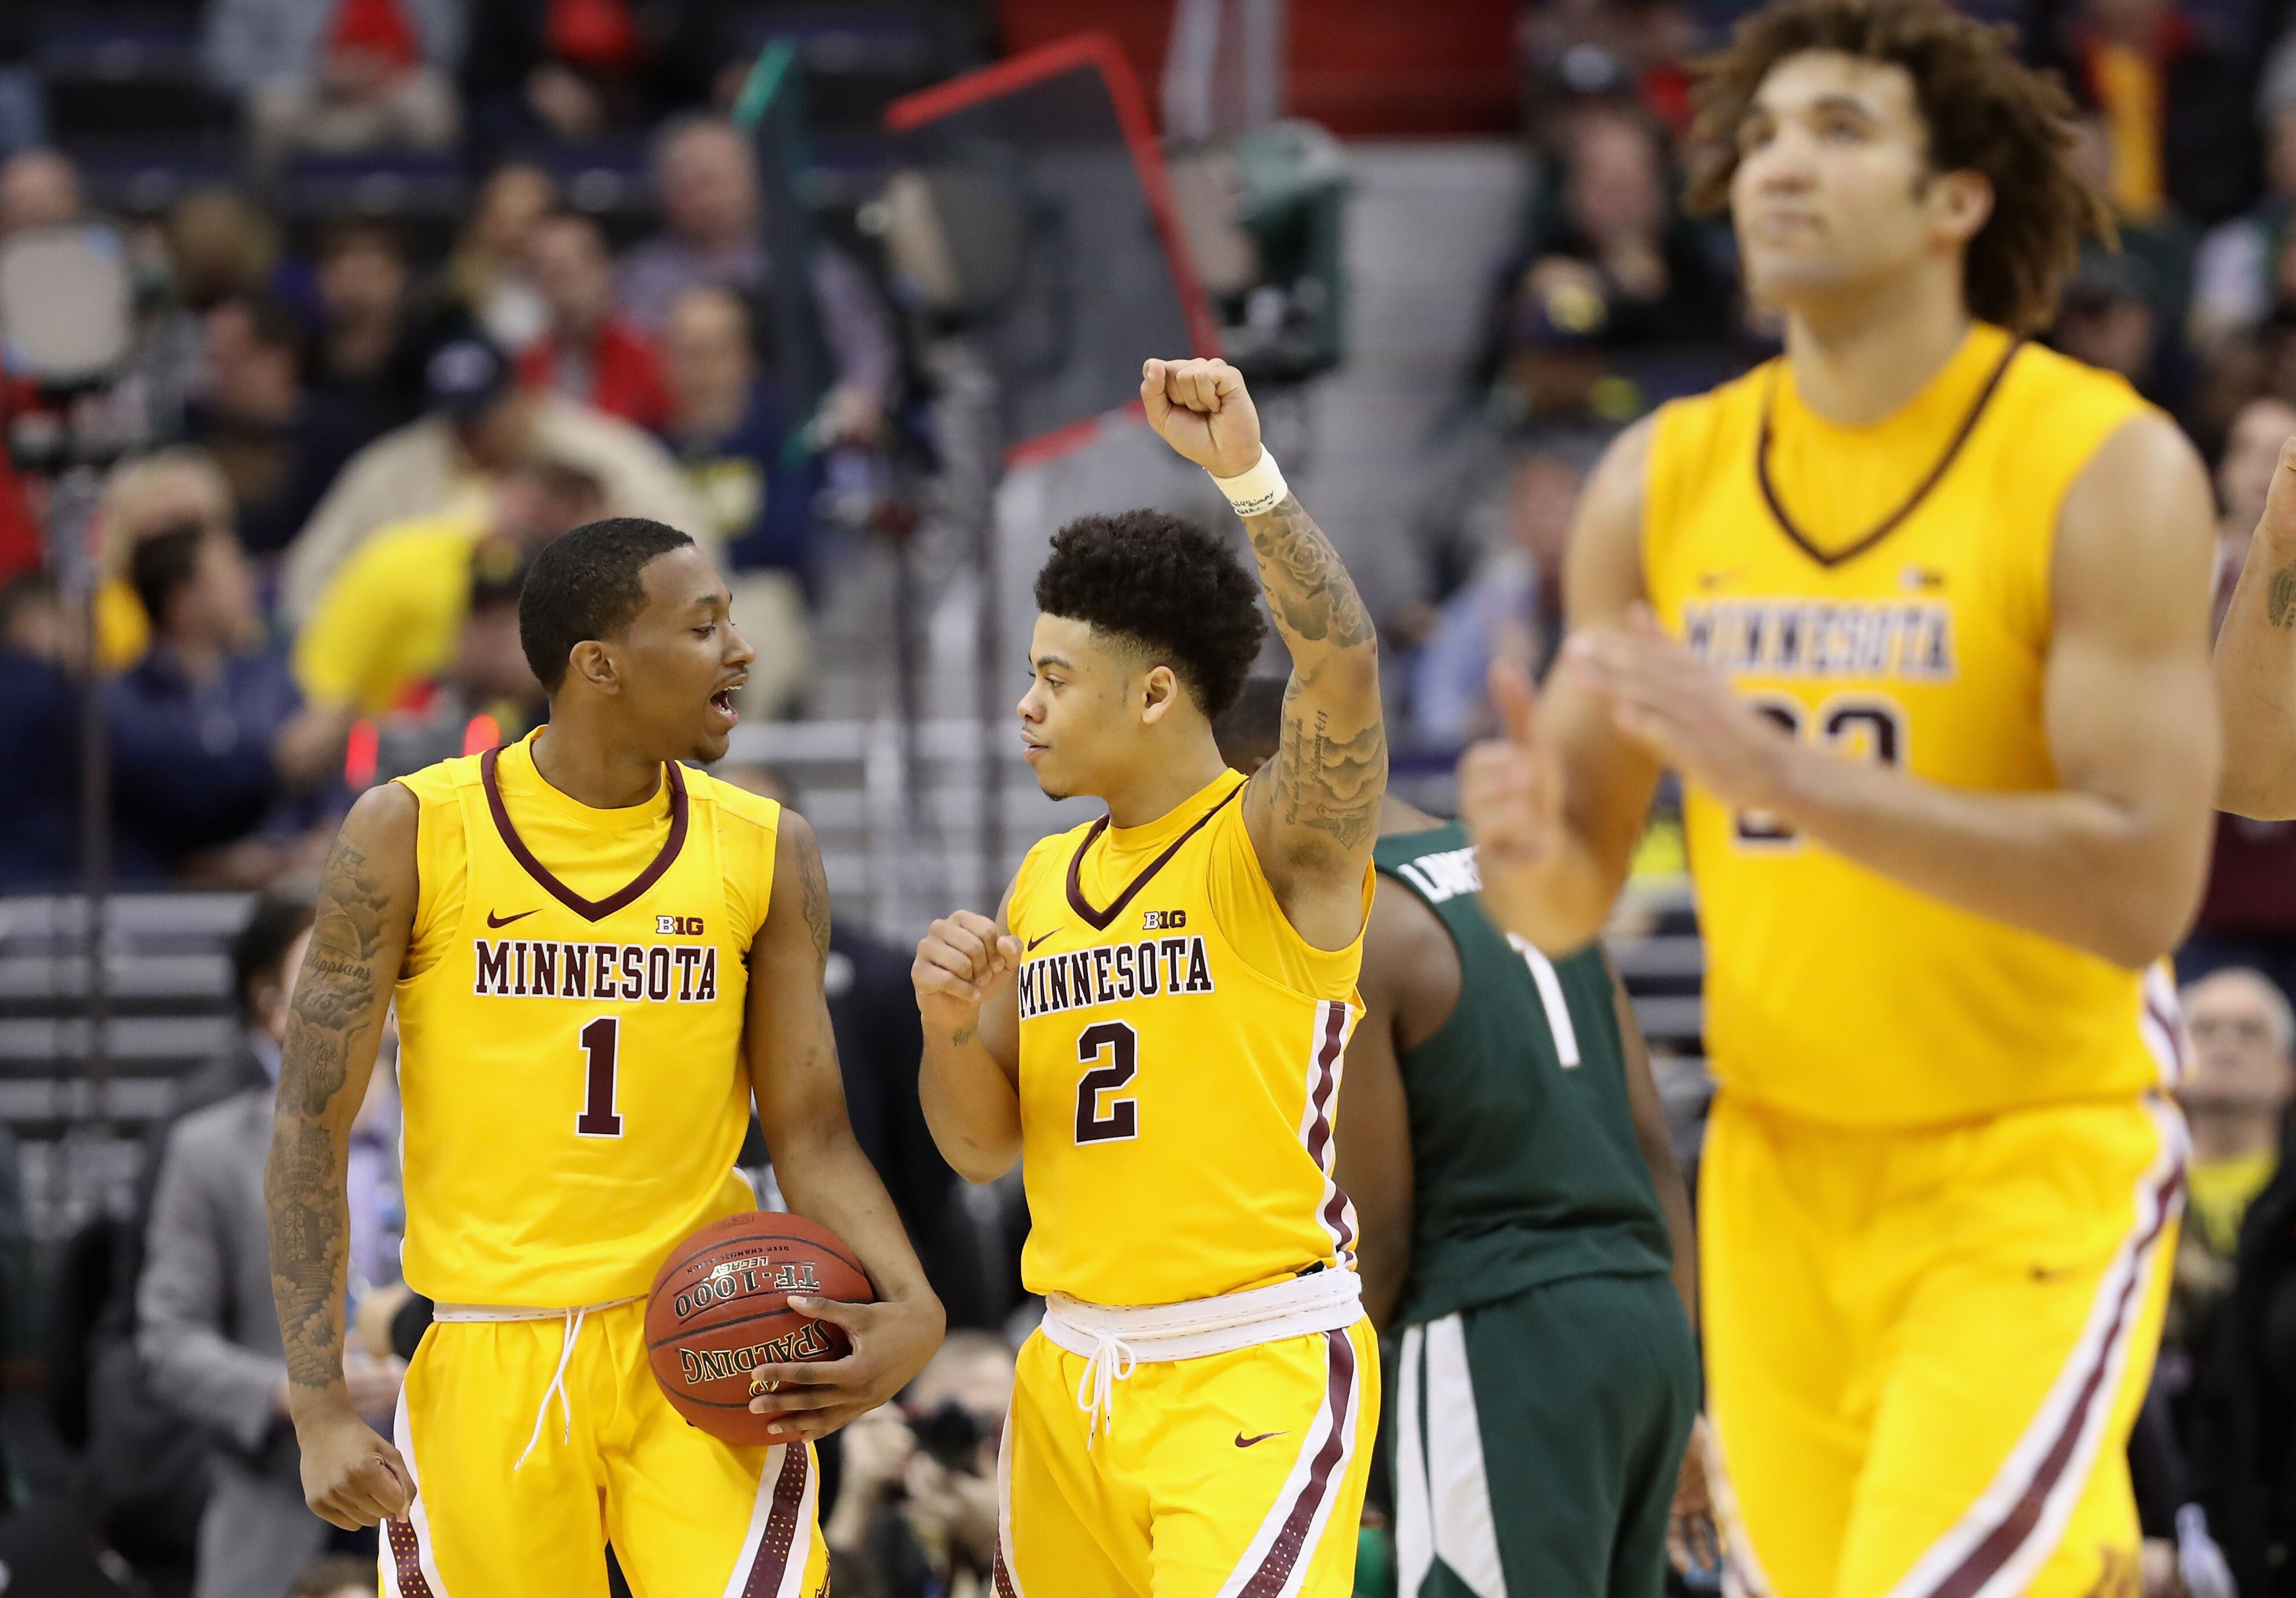 minnesota gophers basketball preview: roster breakdown